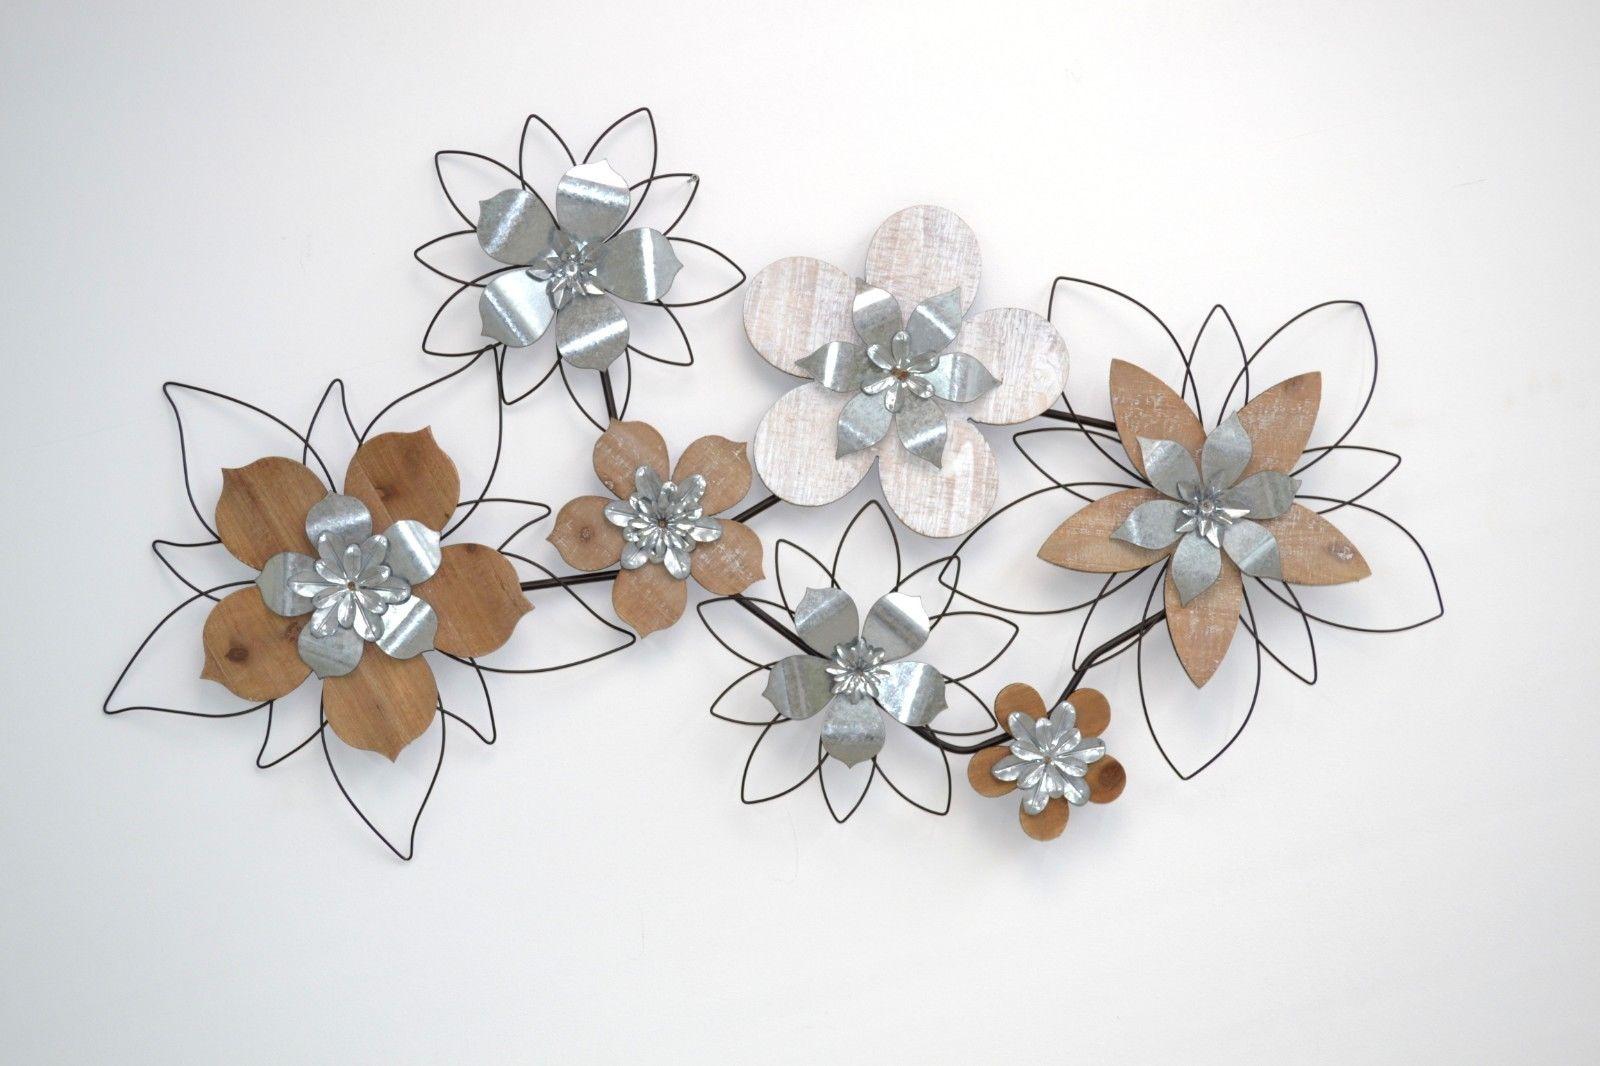 Design wanddekoration bl ten metall wandbild wanddeko wandrelief deko modern kaufen bei go perfect - Wanddekoration metall ...